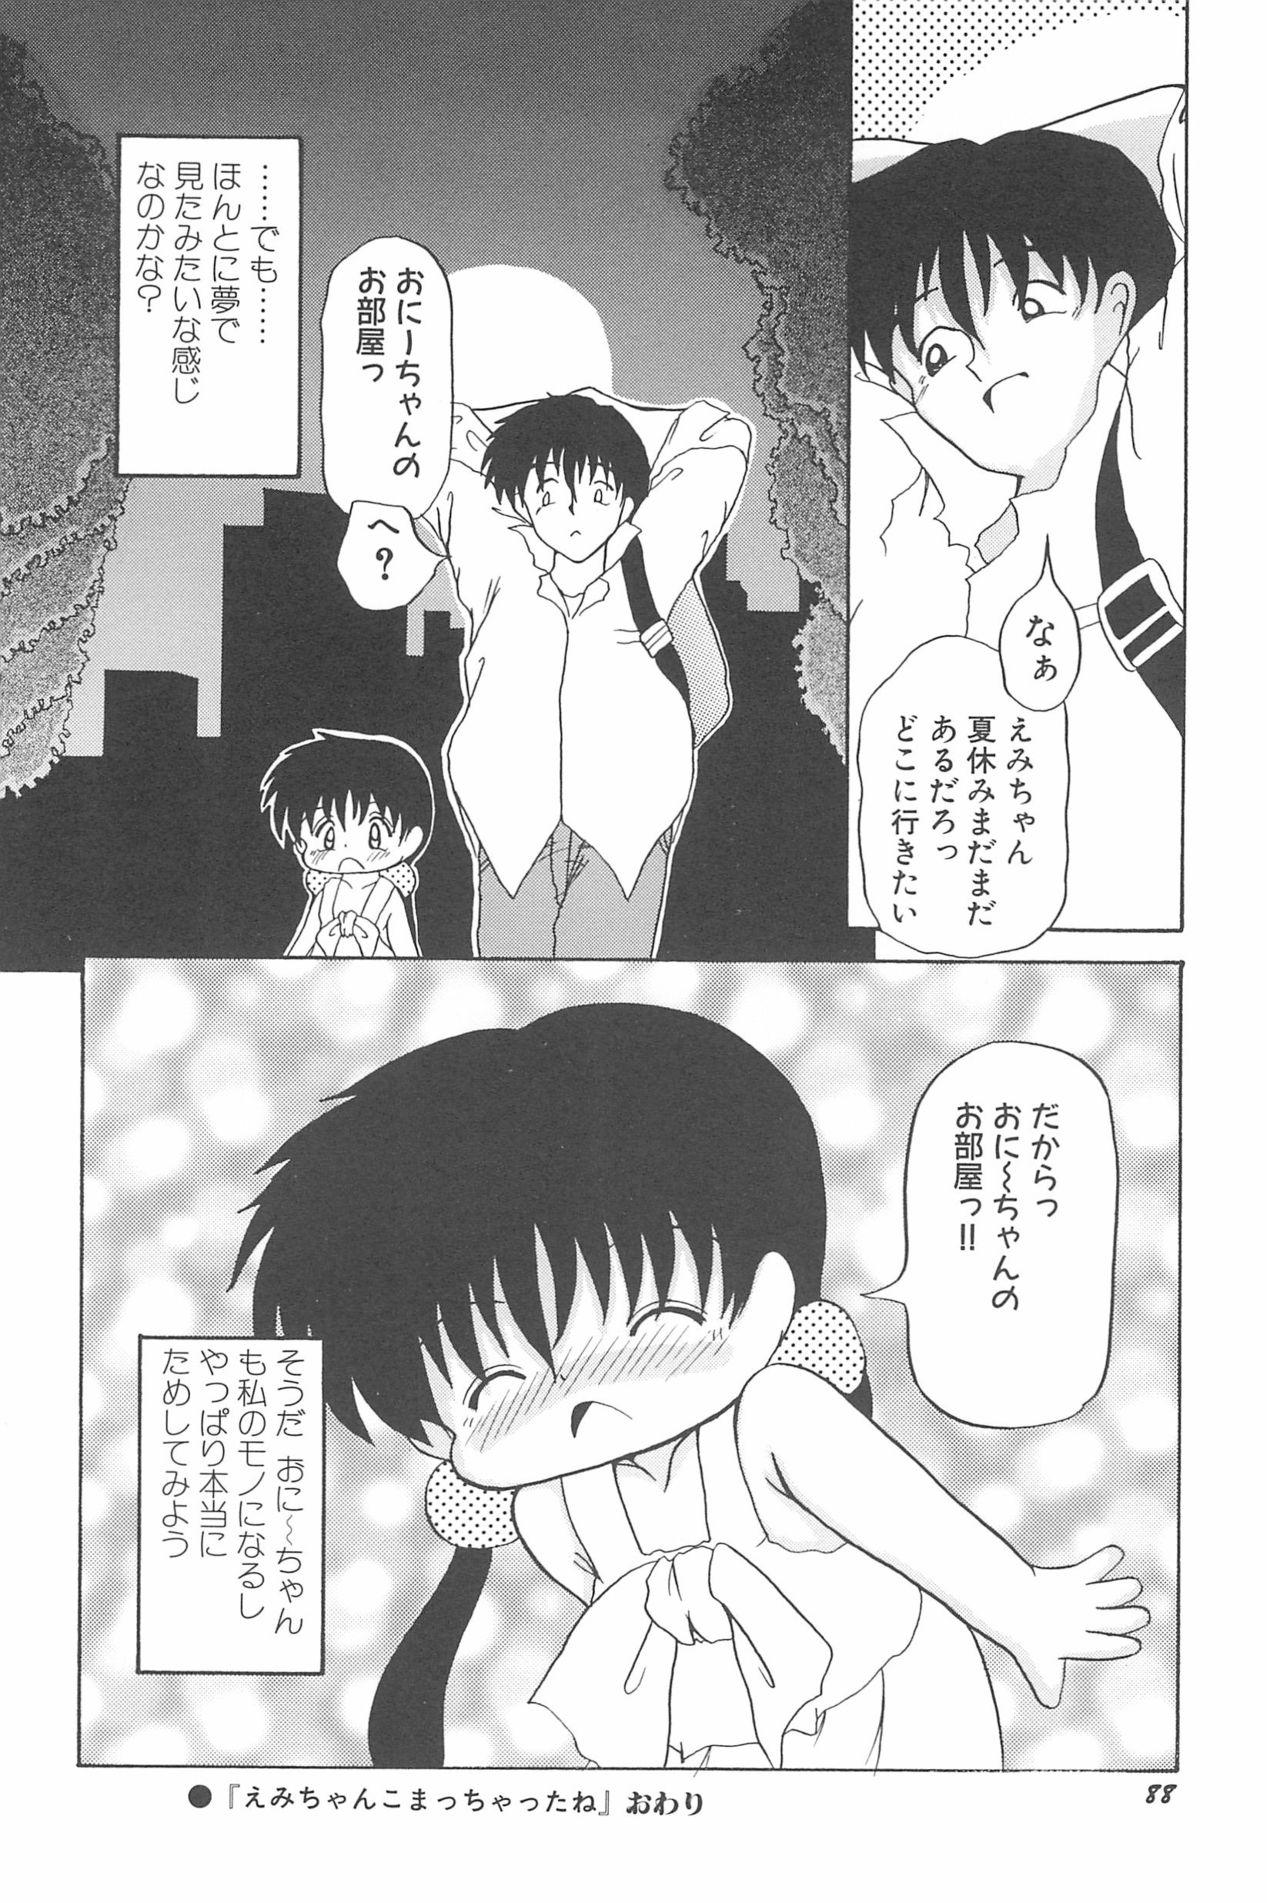 Aoi Shojokyuu 93